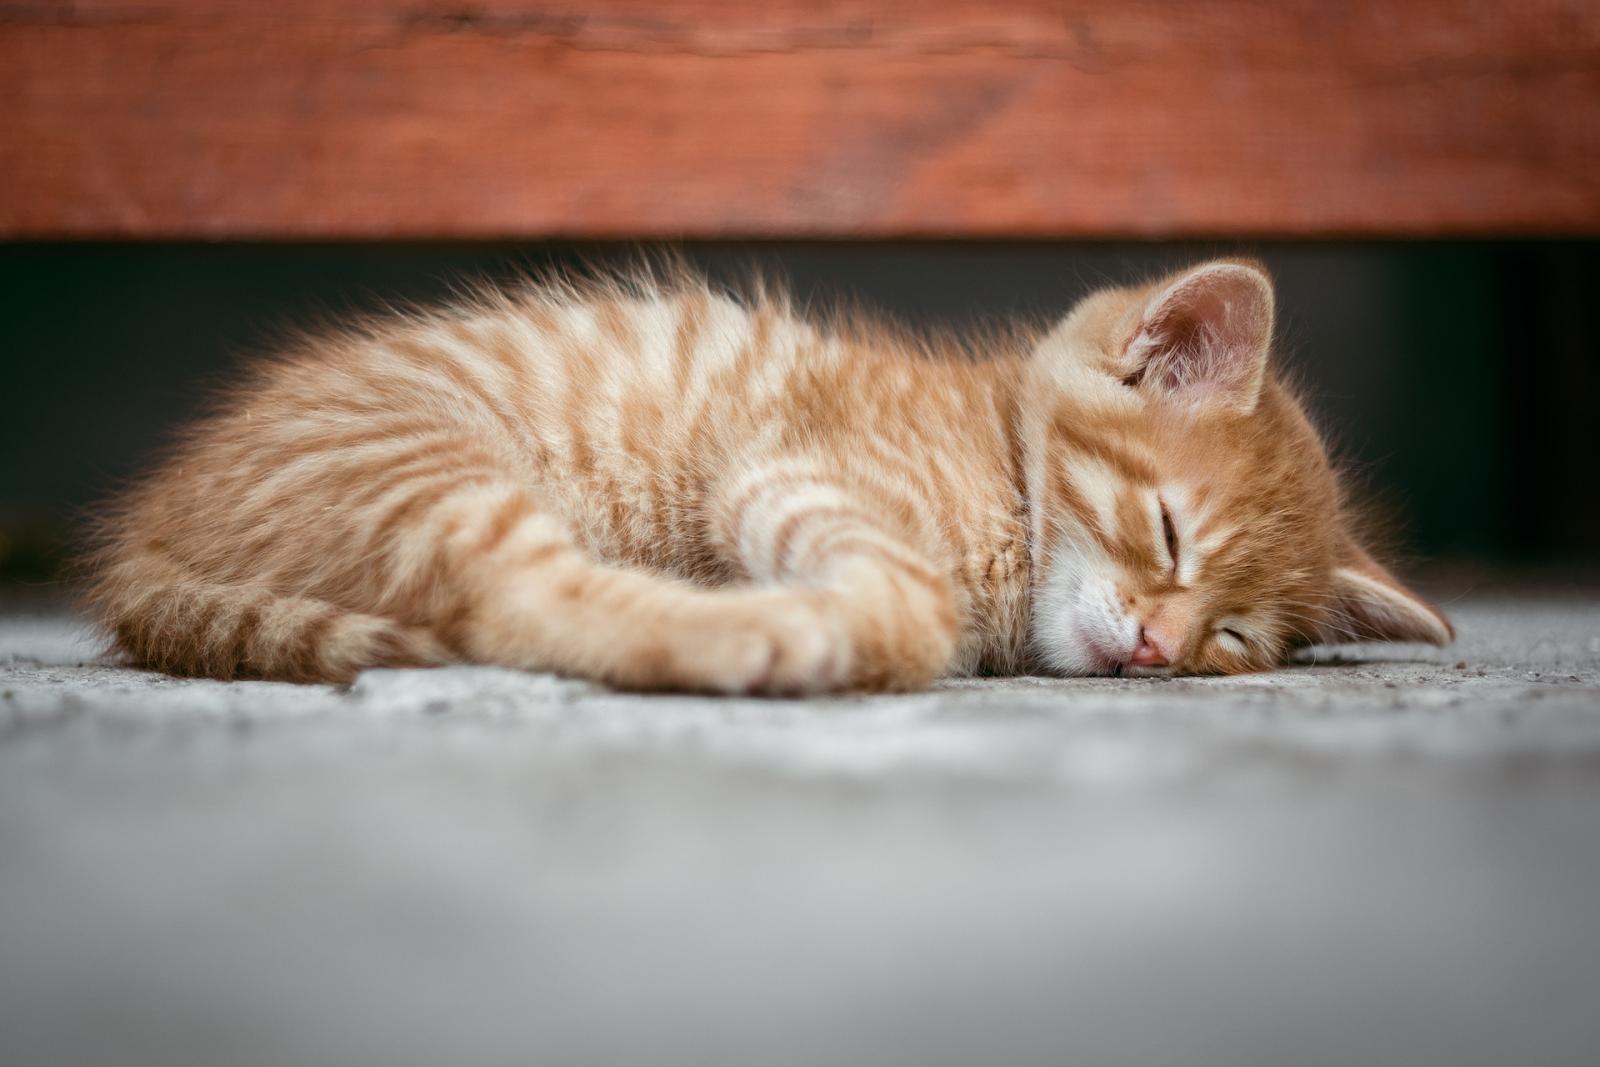 kitty sleeping & relaxing on floor